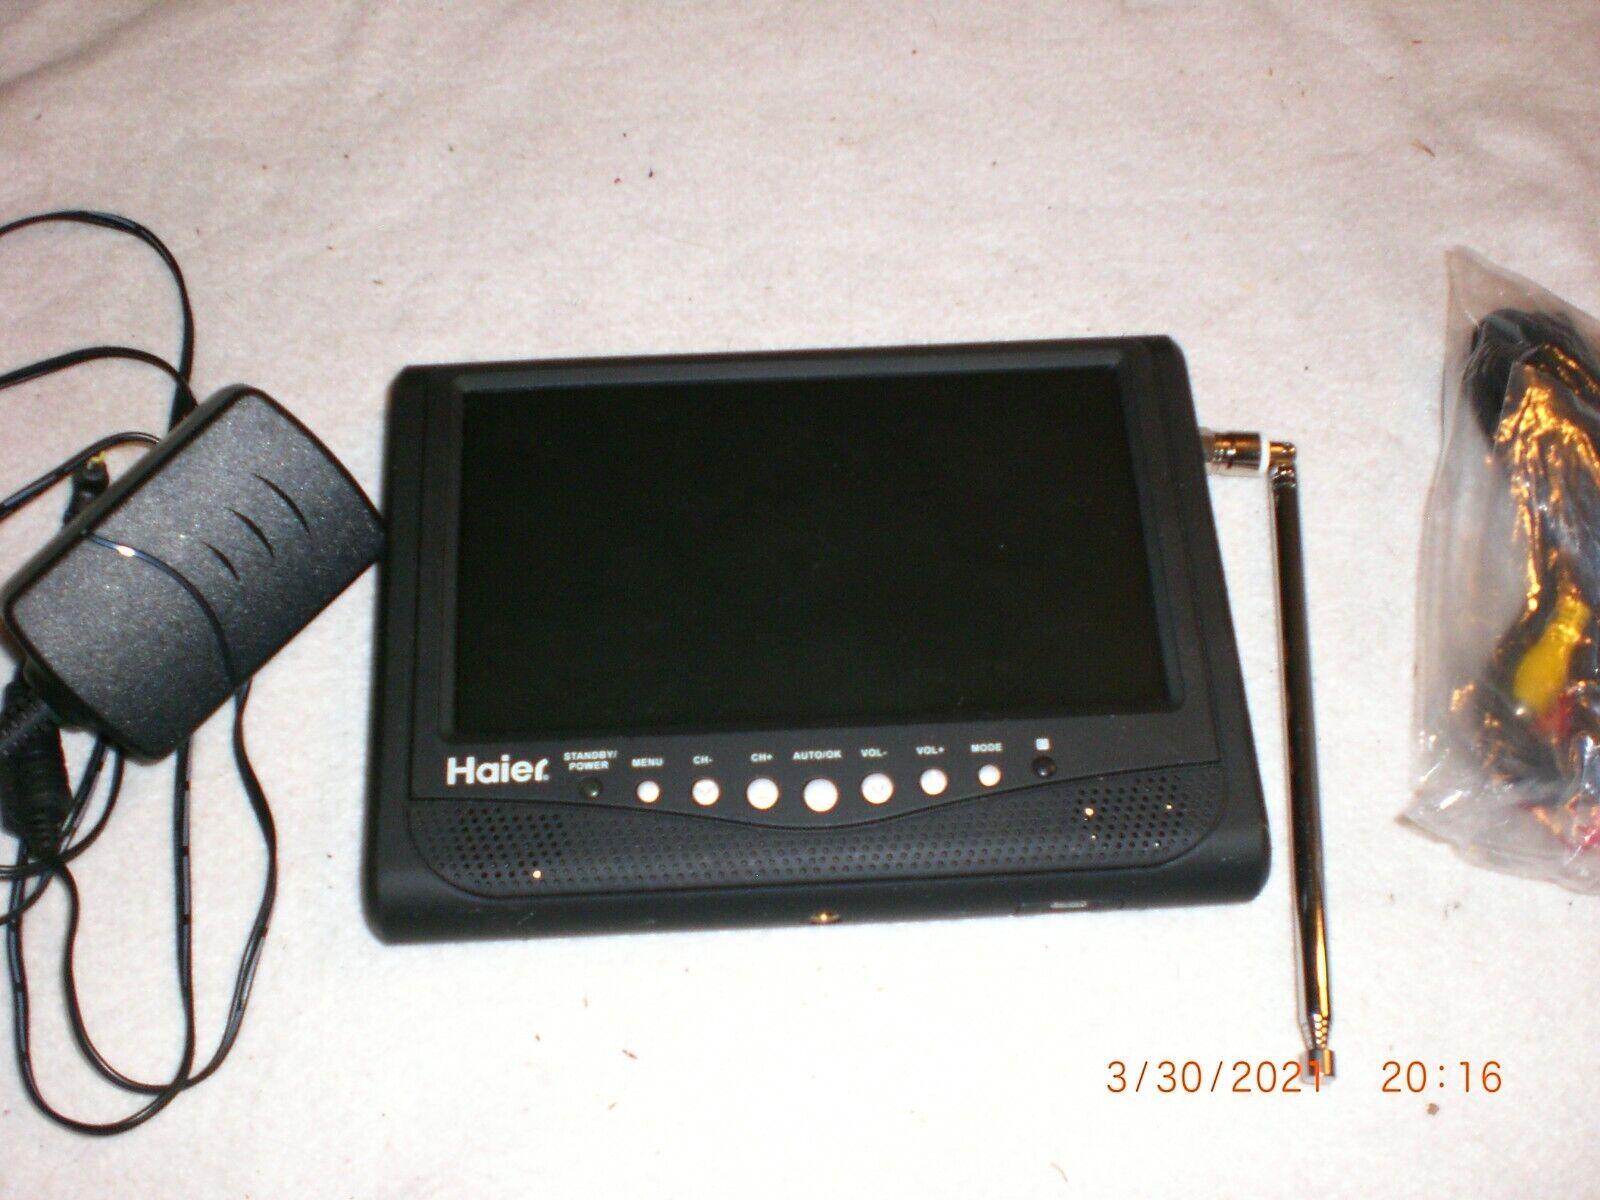 Haier HLT71 7 Inch Portable LCD TV